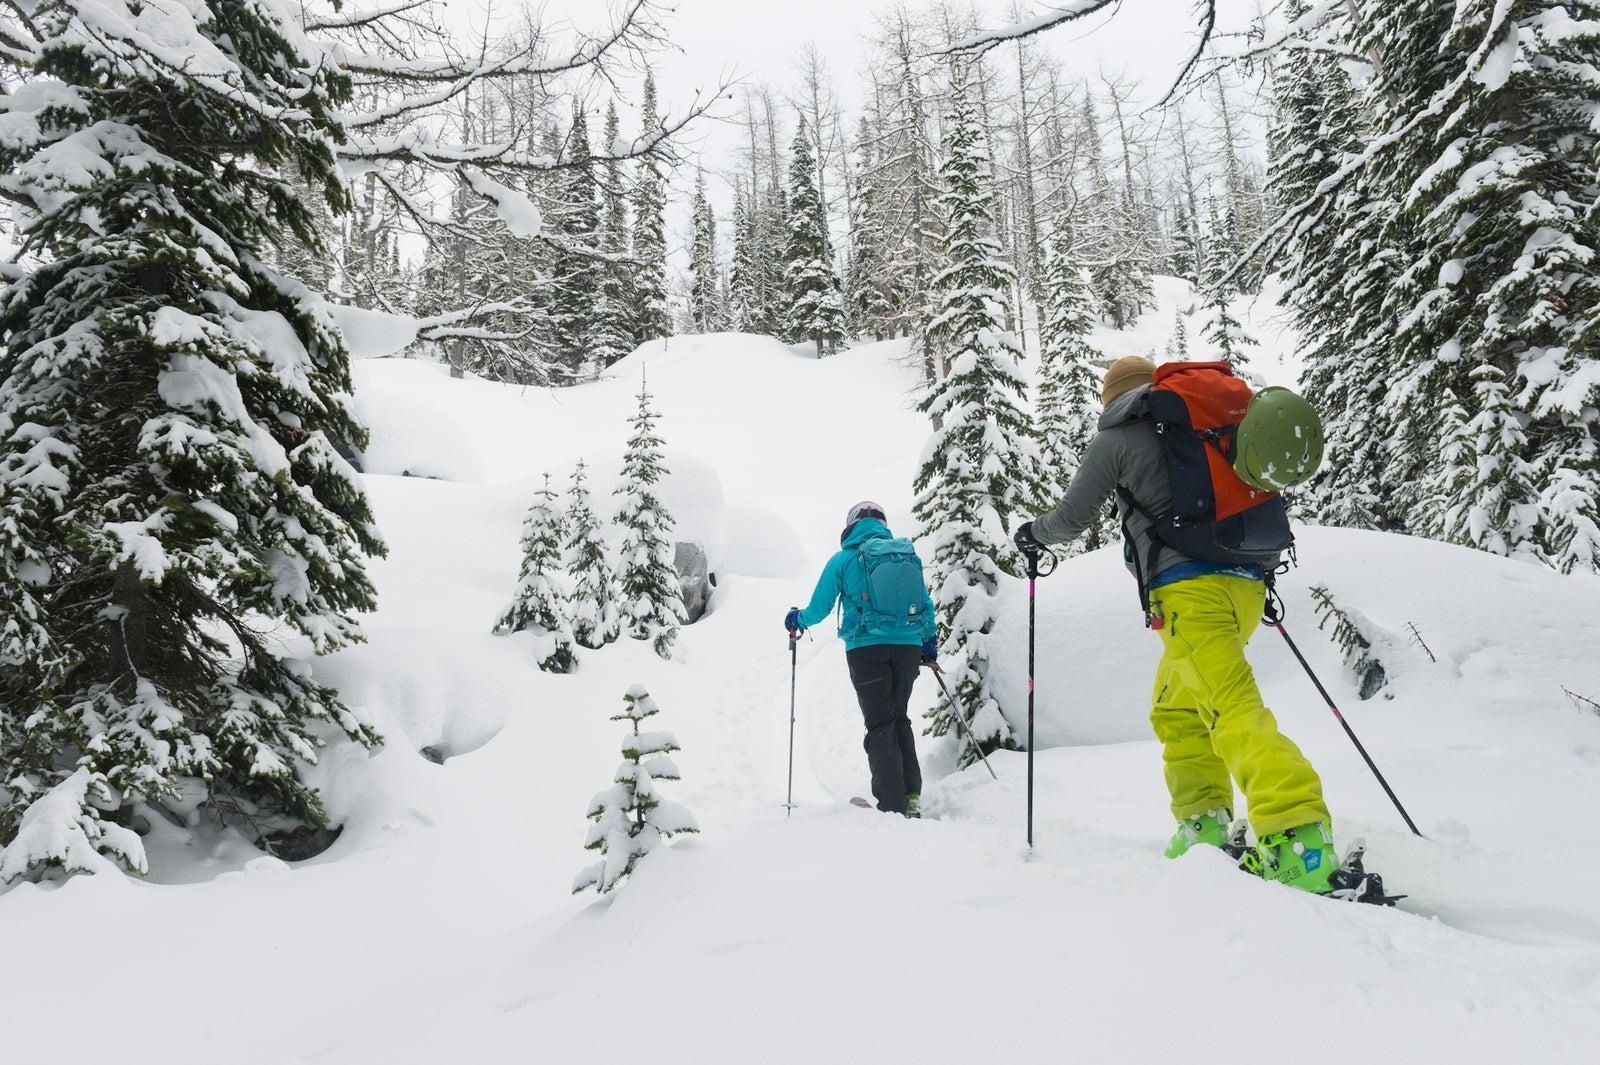 Soft shell vs. hard shell ski jackets: What do you need?